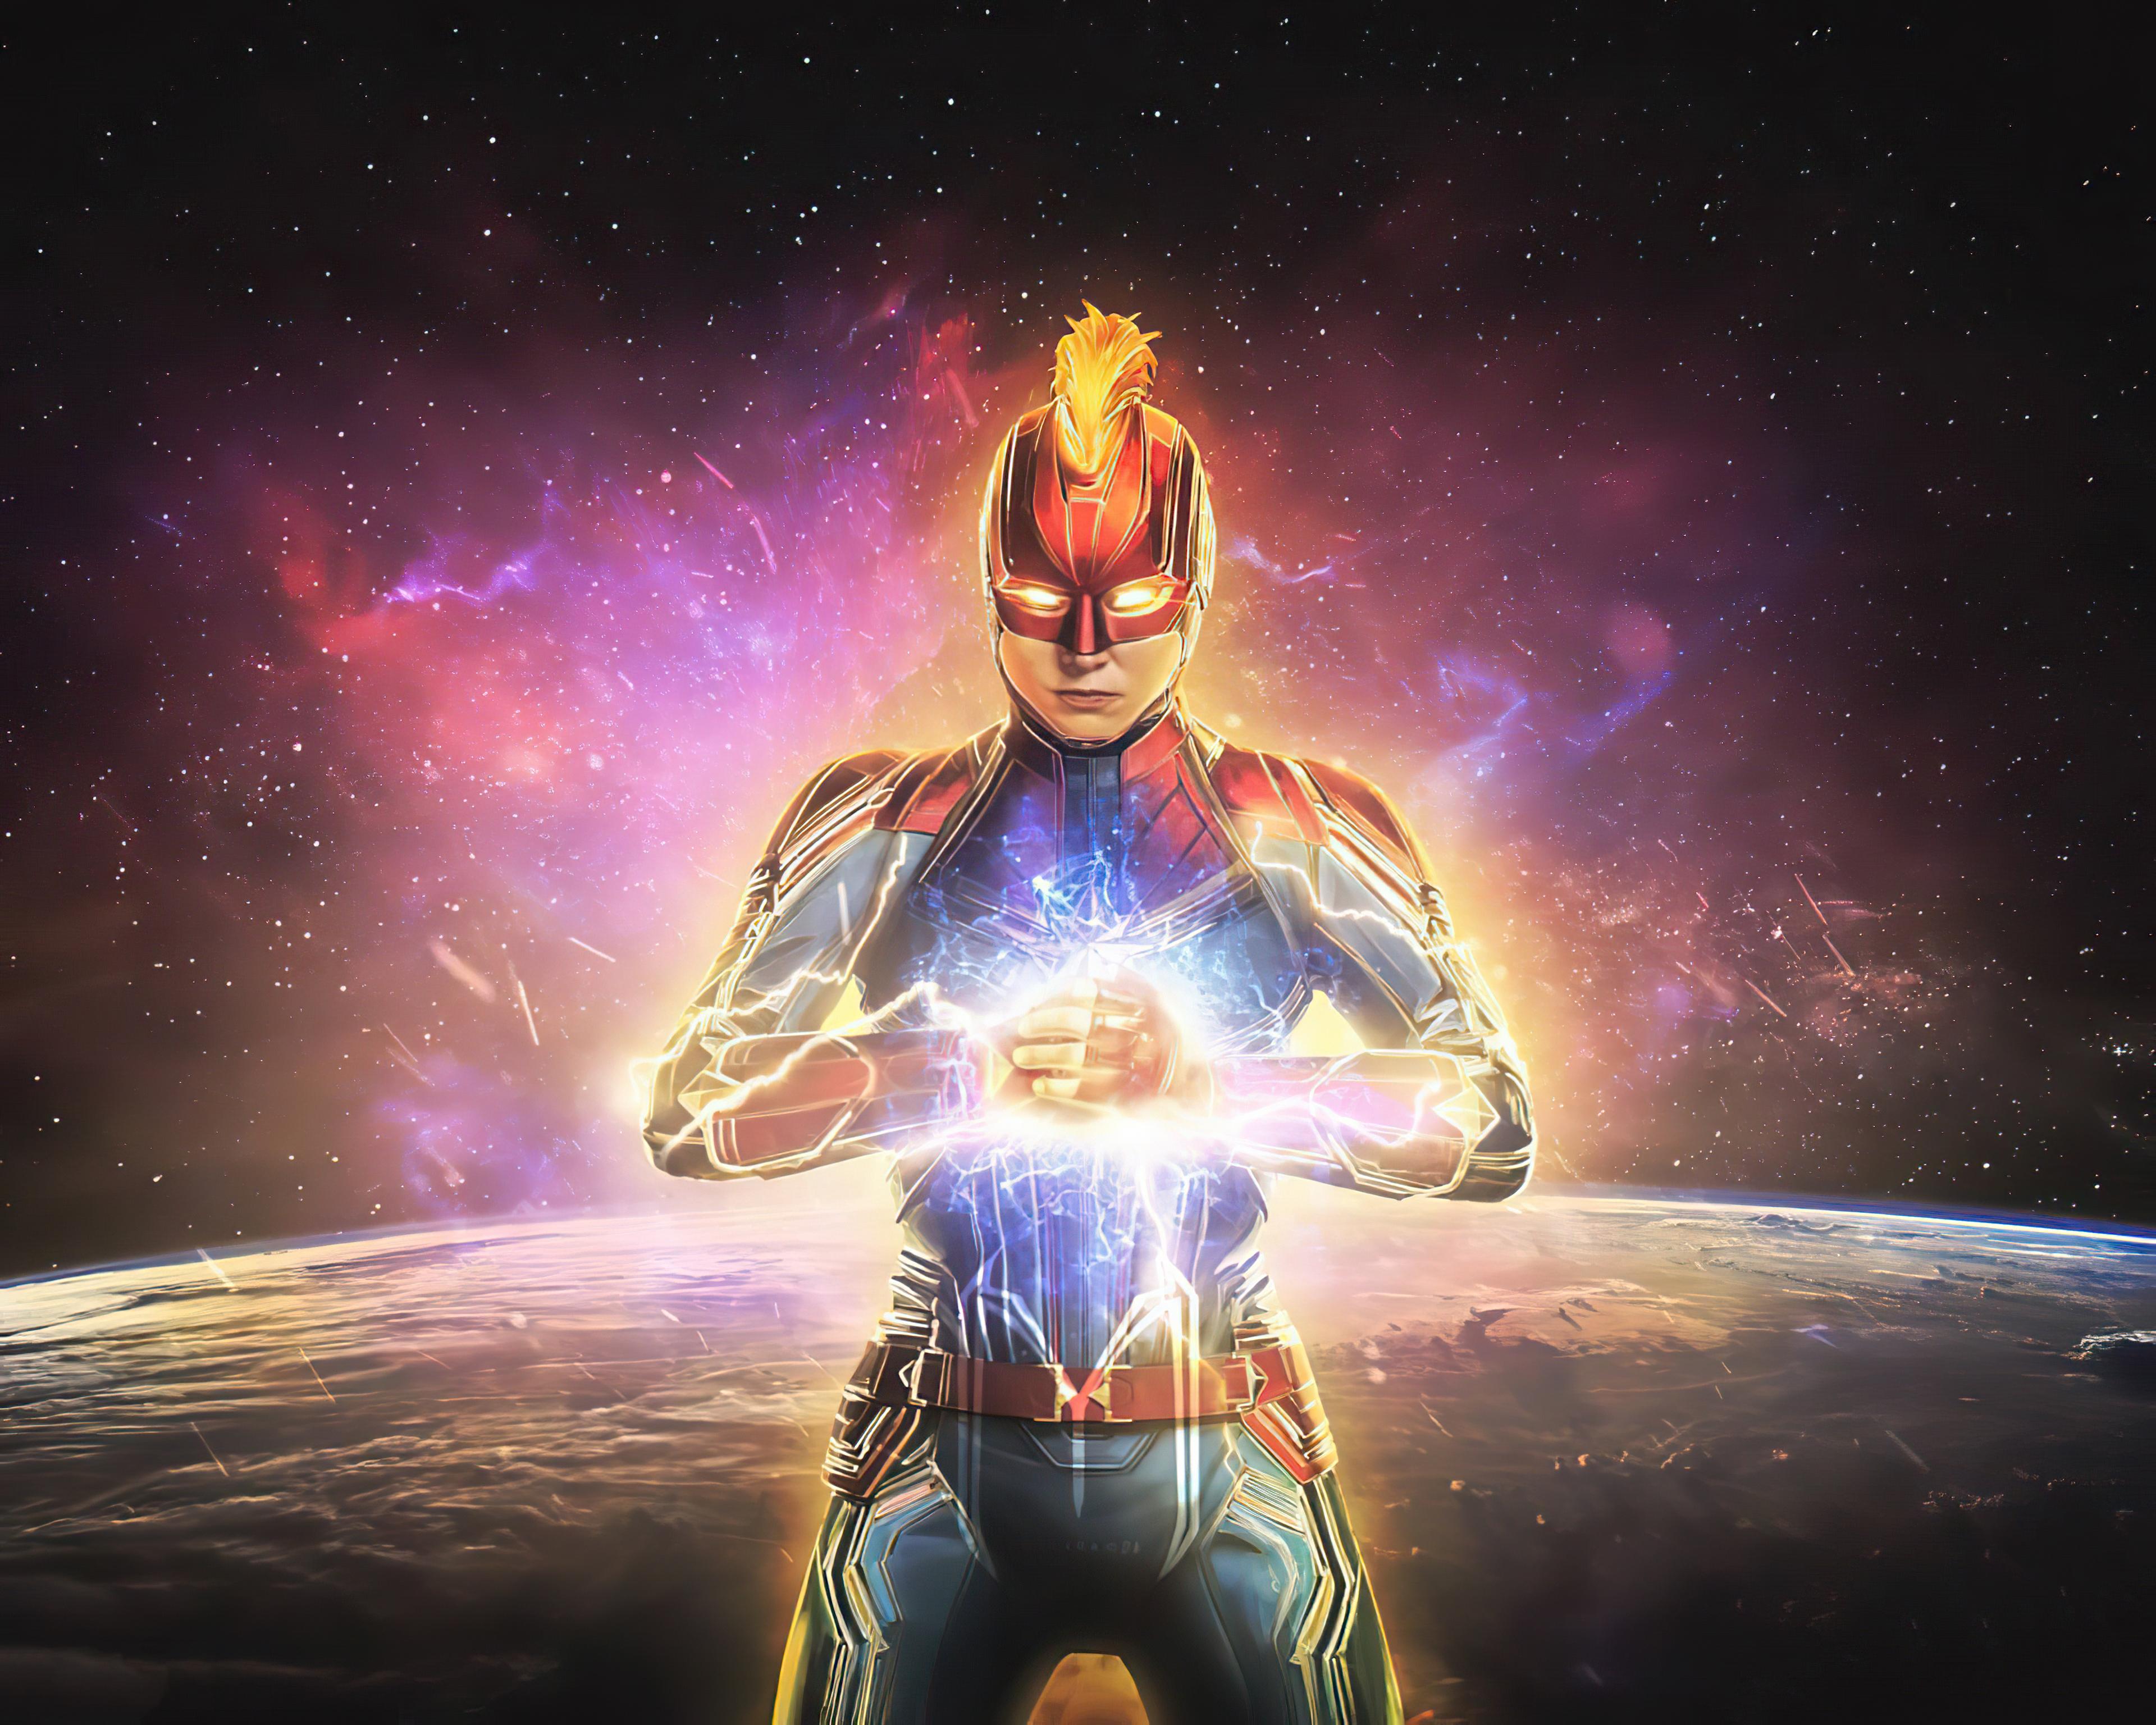 2020 Captain Marvel 4k, HD Superheroes, 4k Wallpapers ...